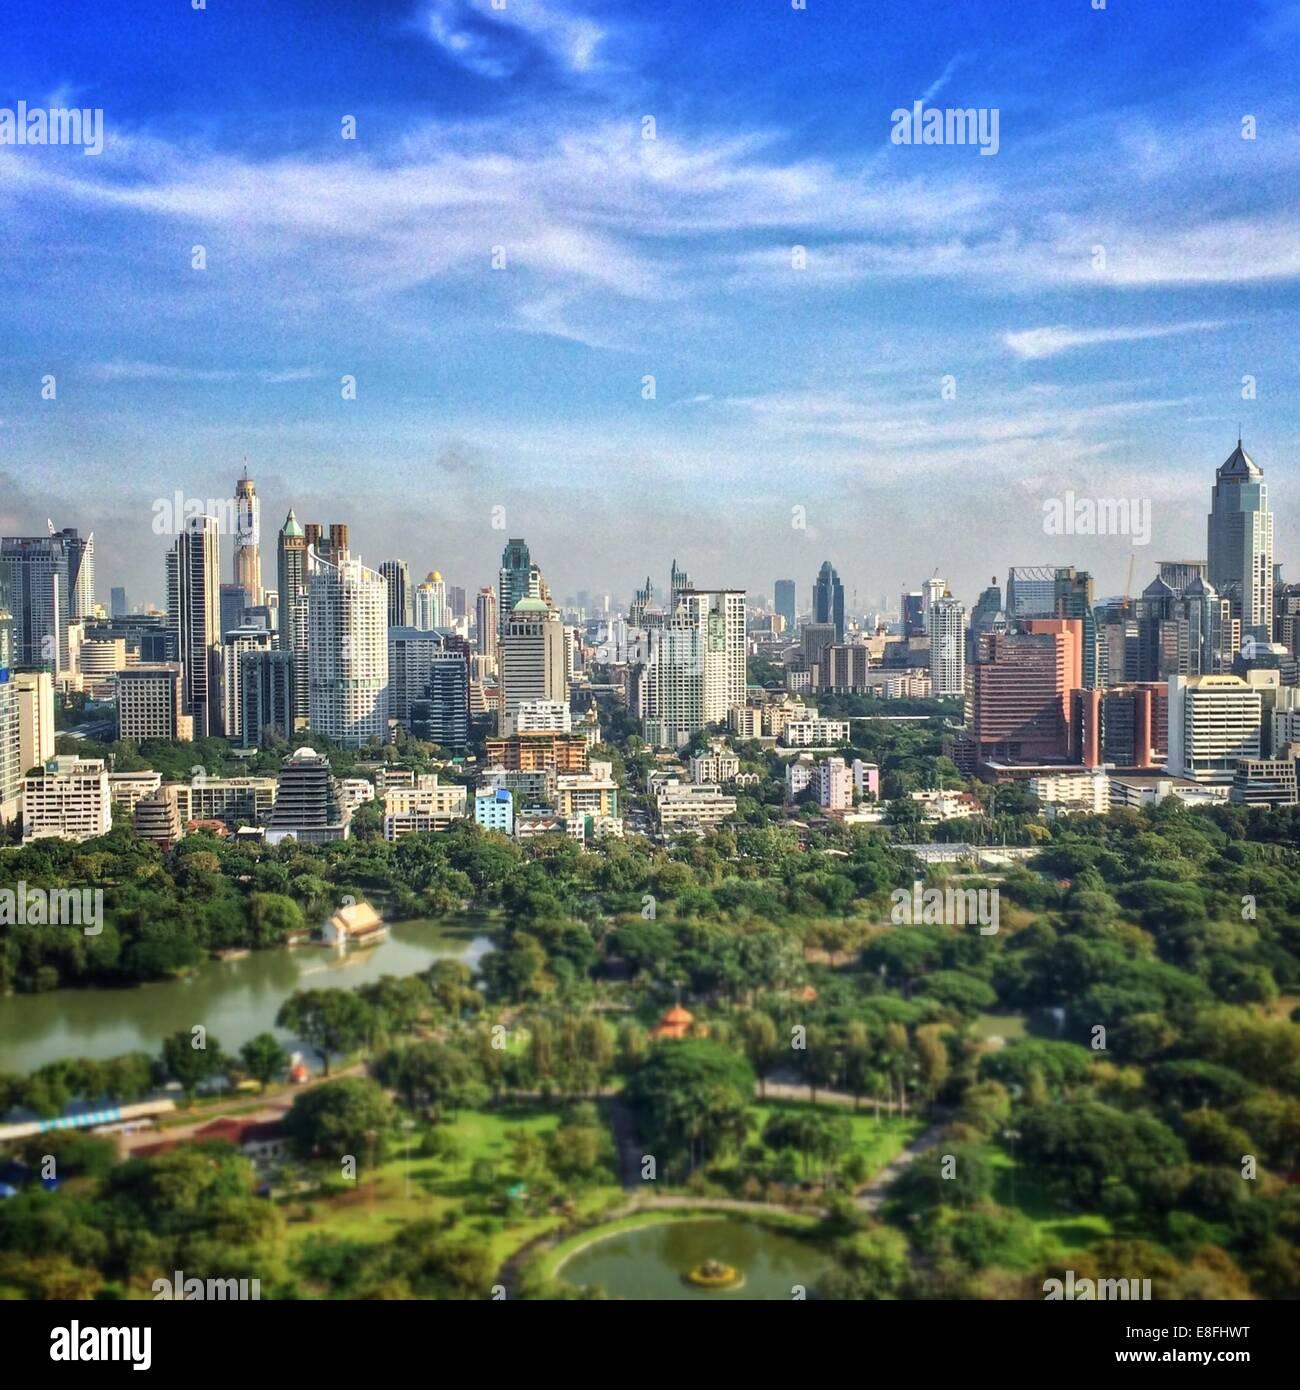 Thailand, Bangkok, Elevated view of cityscape - Stock Image